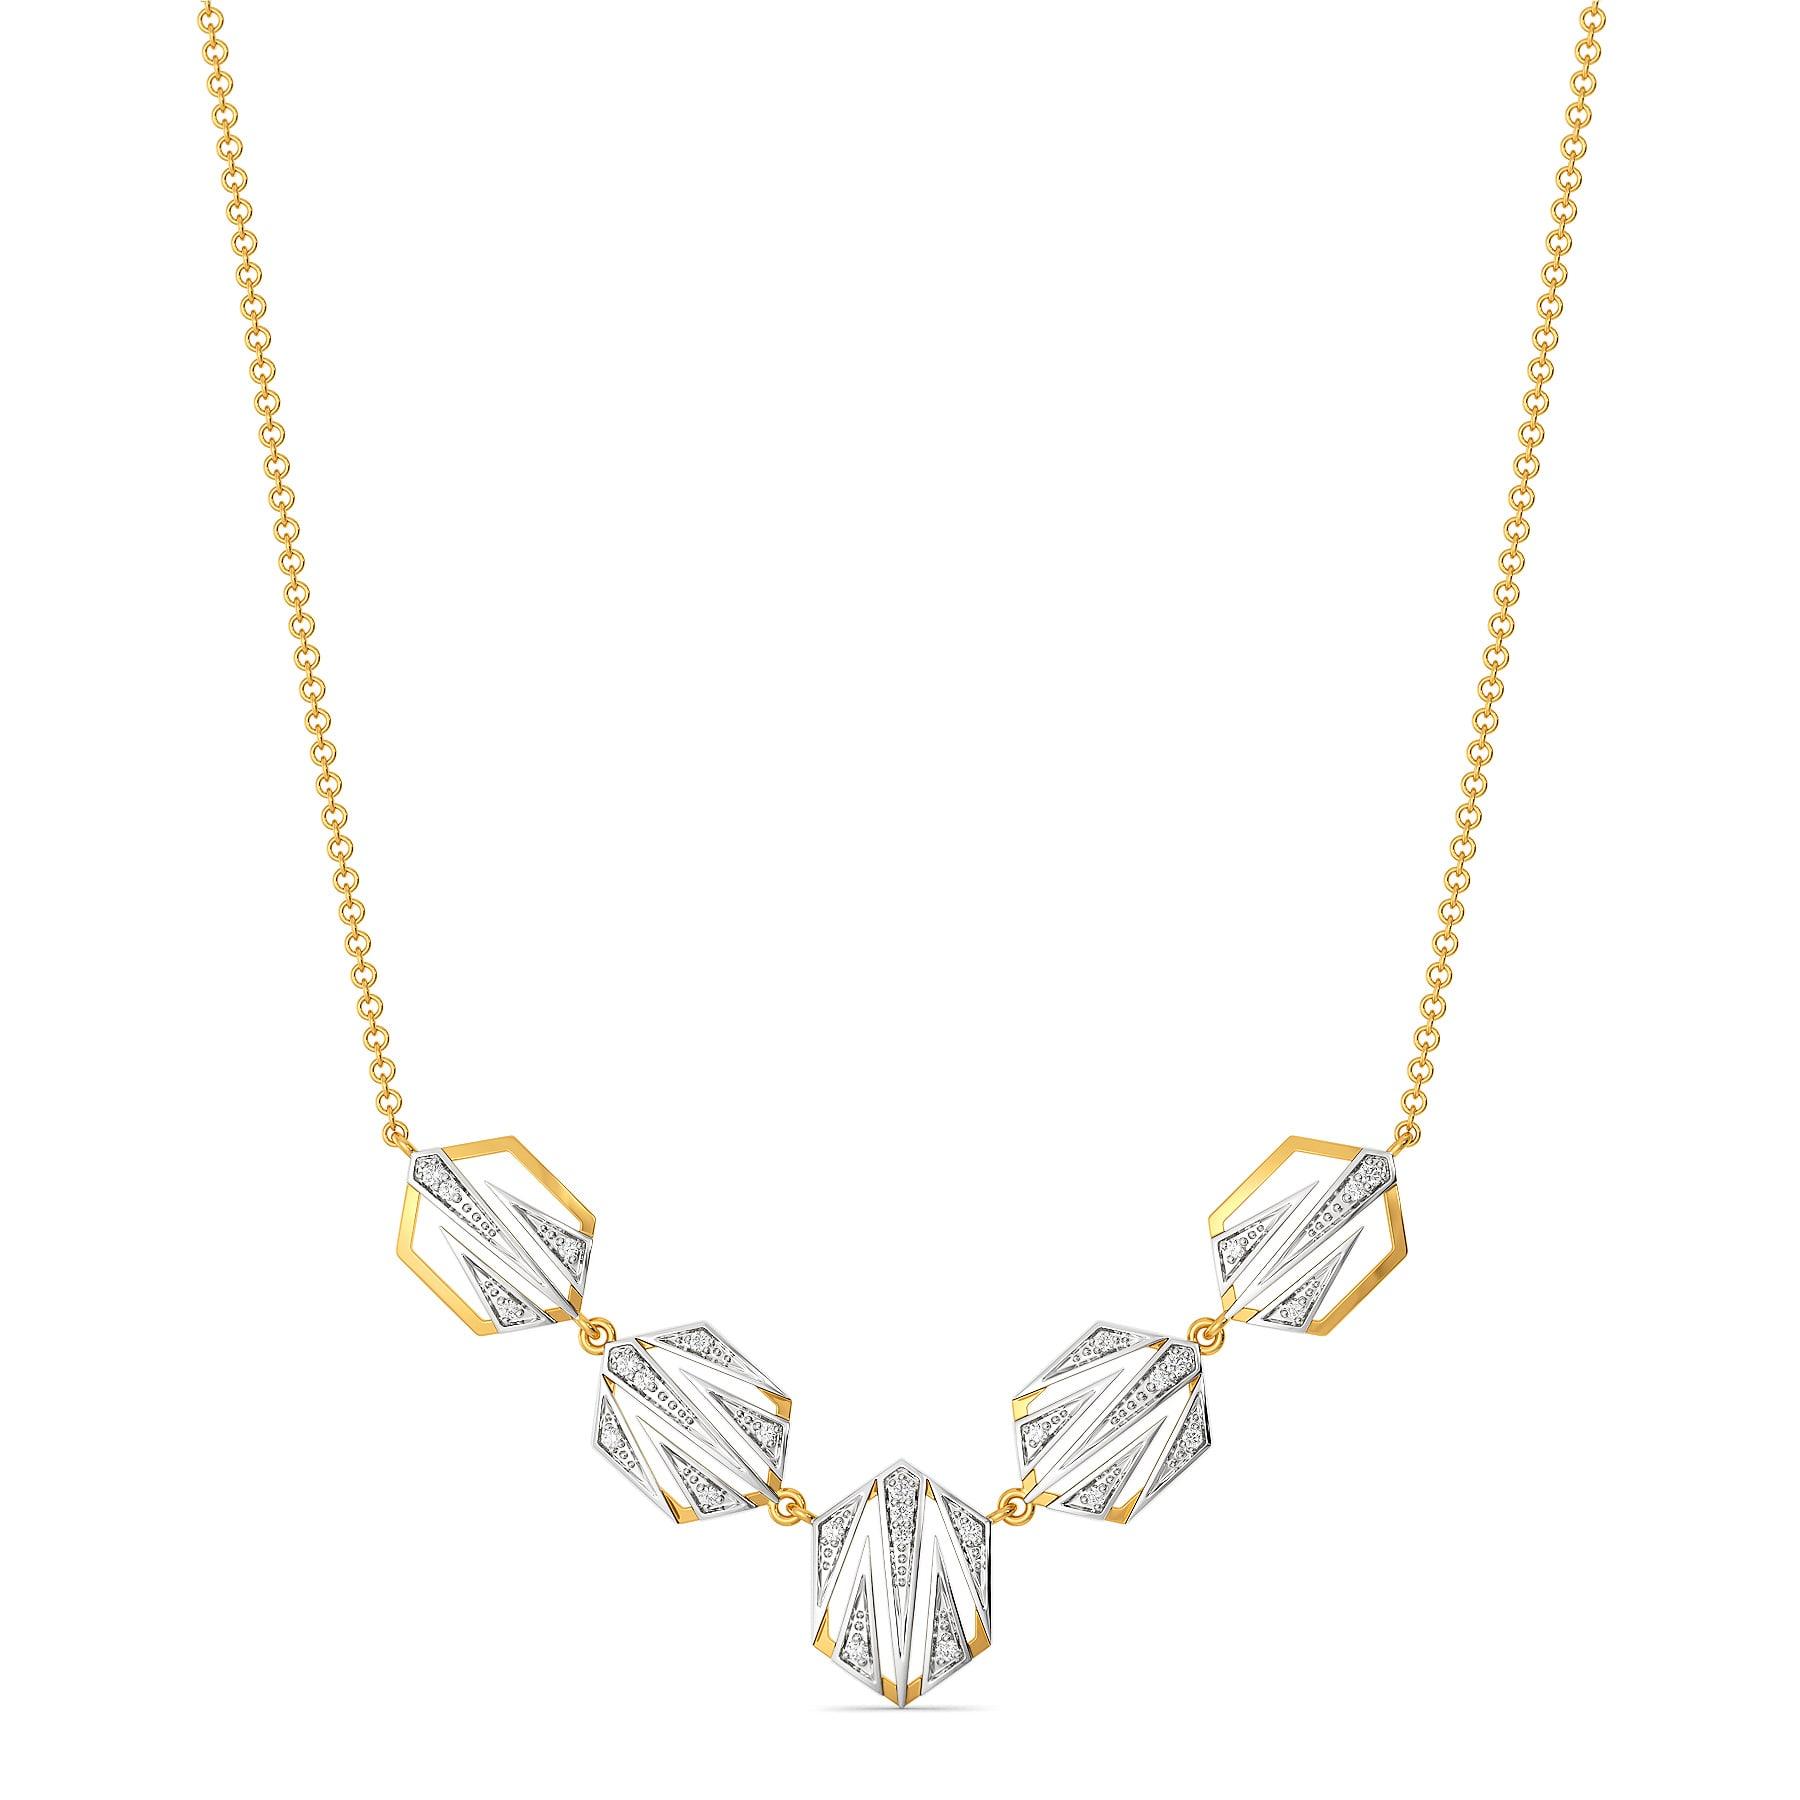 Sharp N Chic Diamond Necklaces